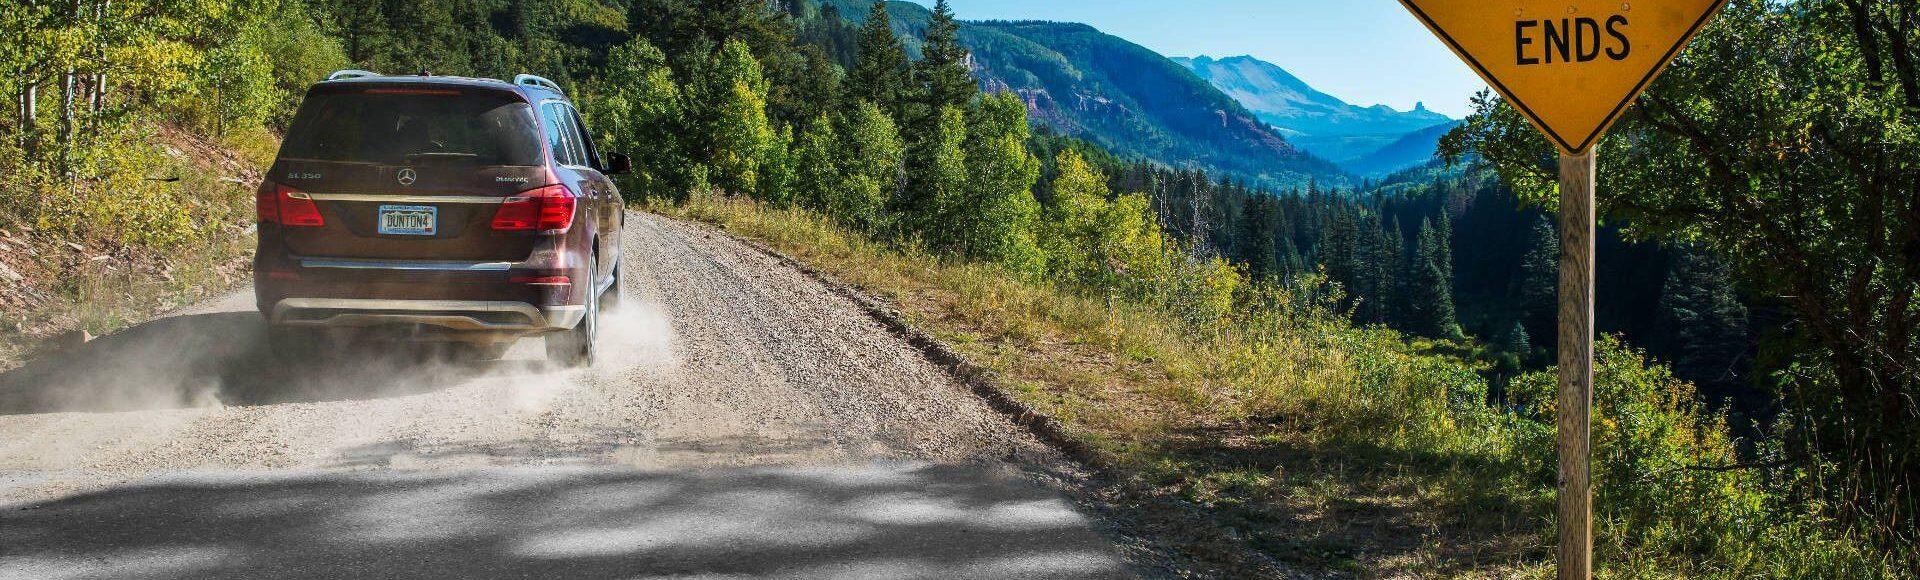 Car driving along Colorado roads